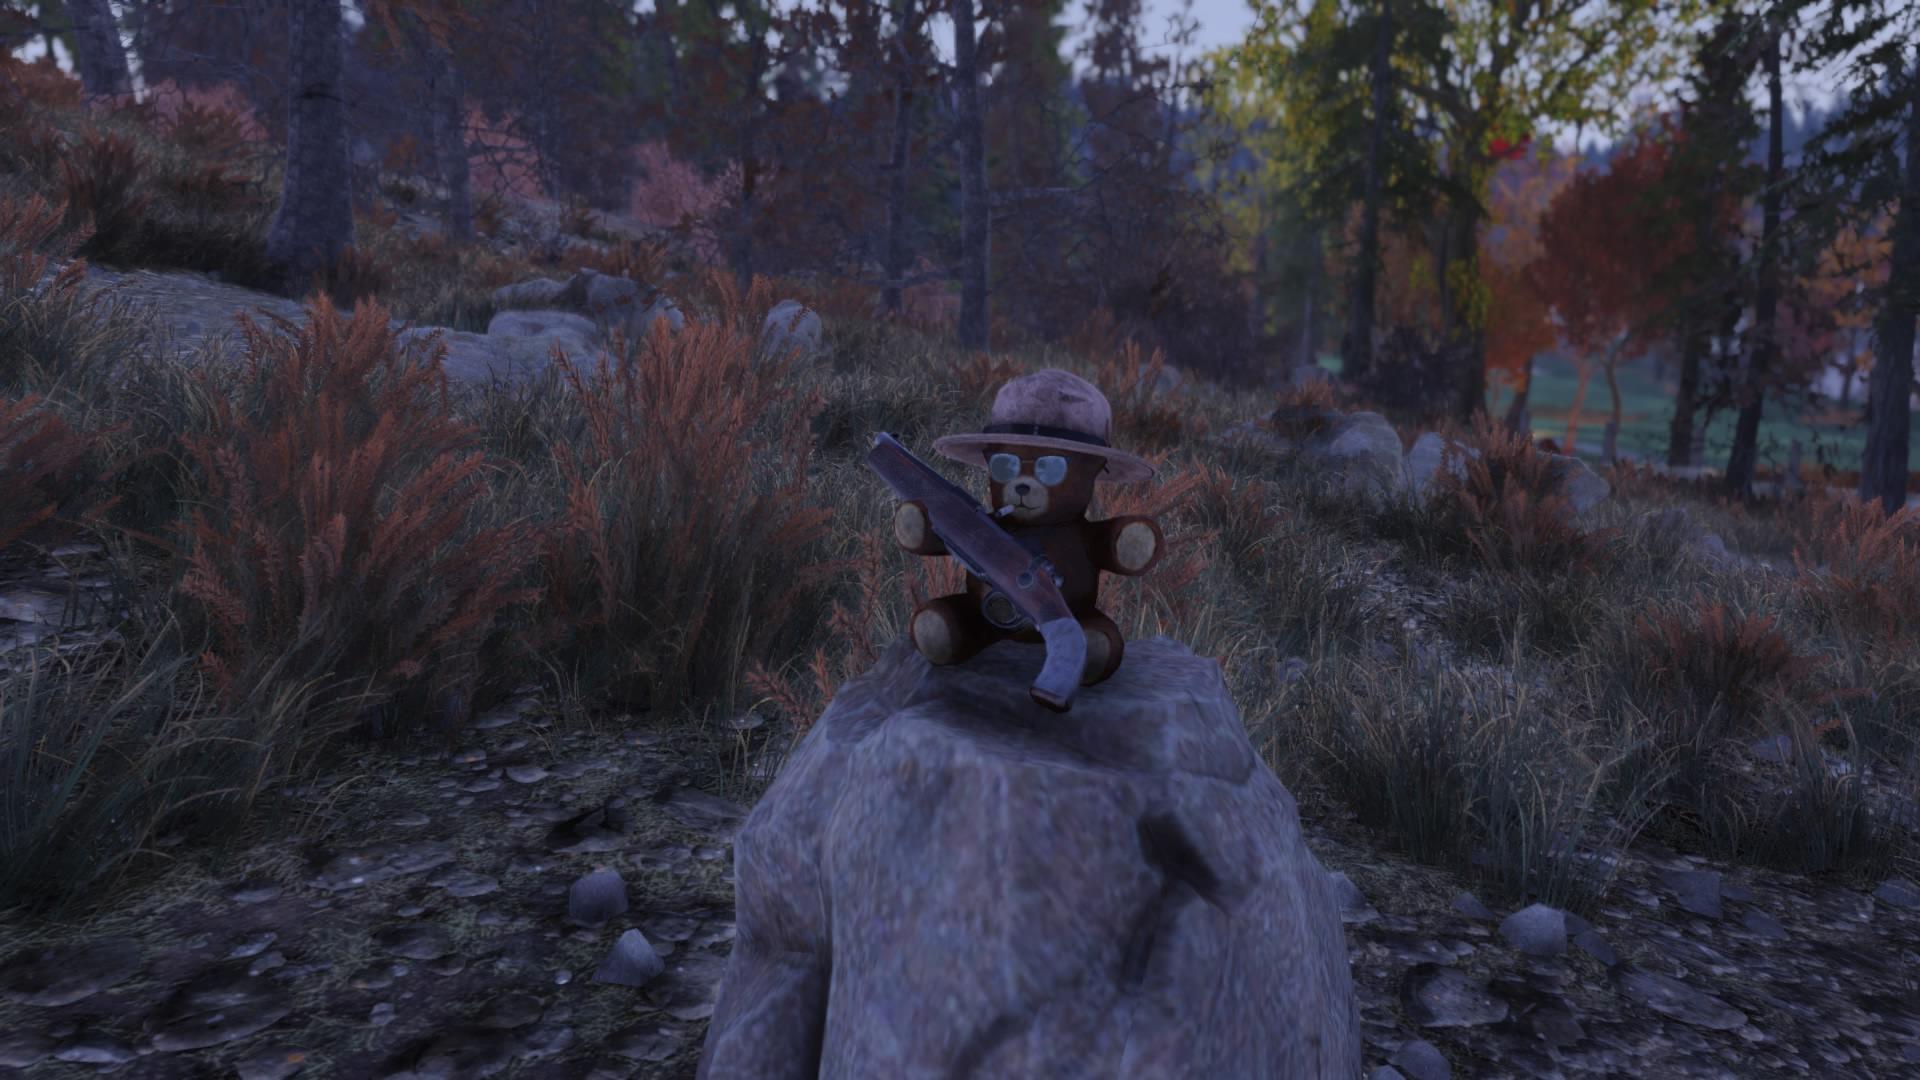 Some Fallout76 easter egg teddy bears – nerdhut